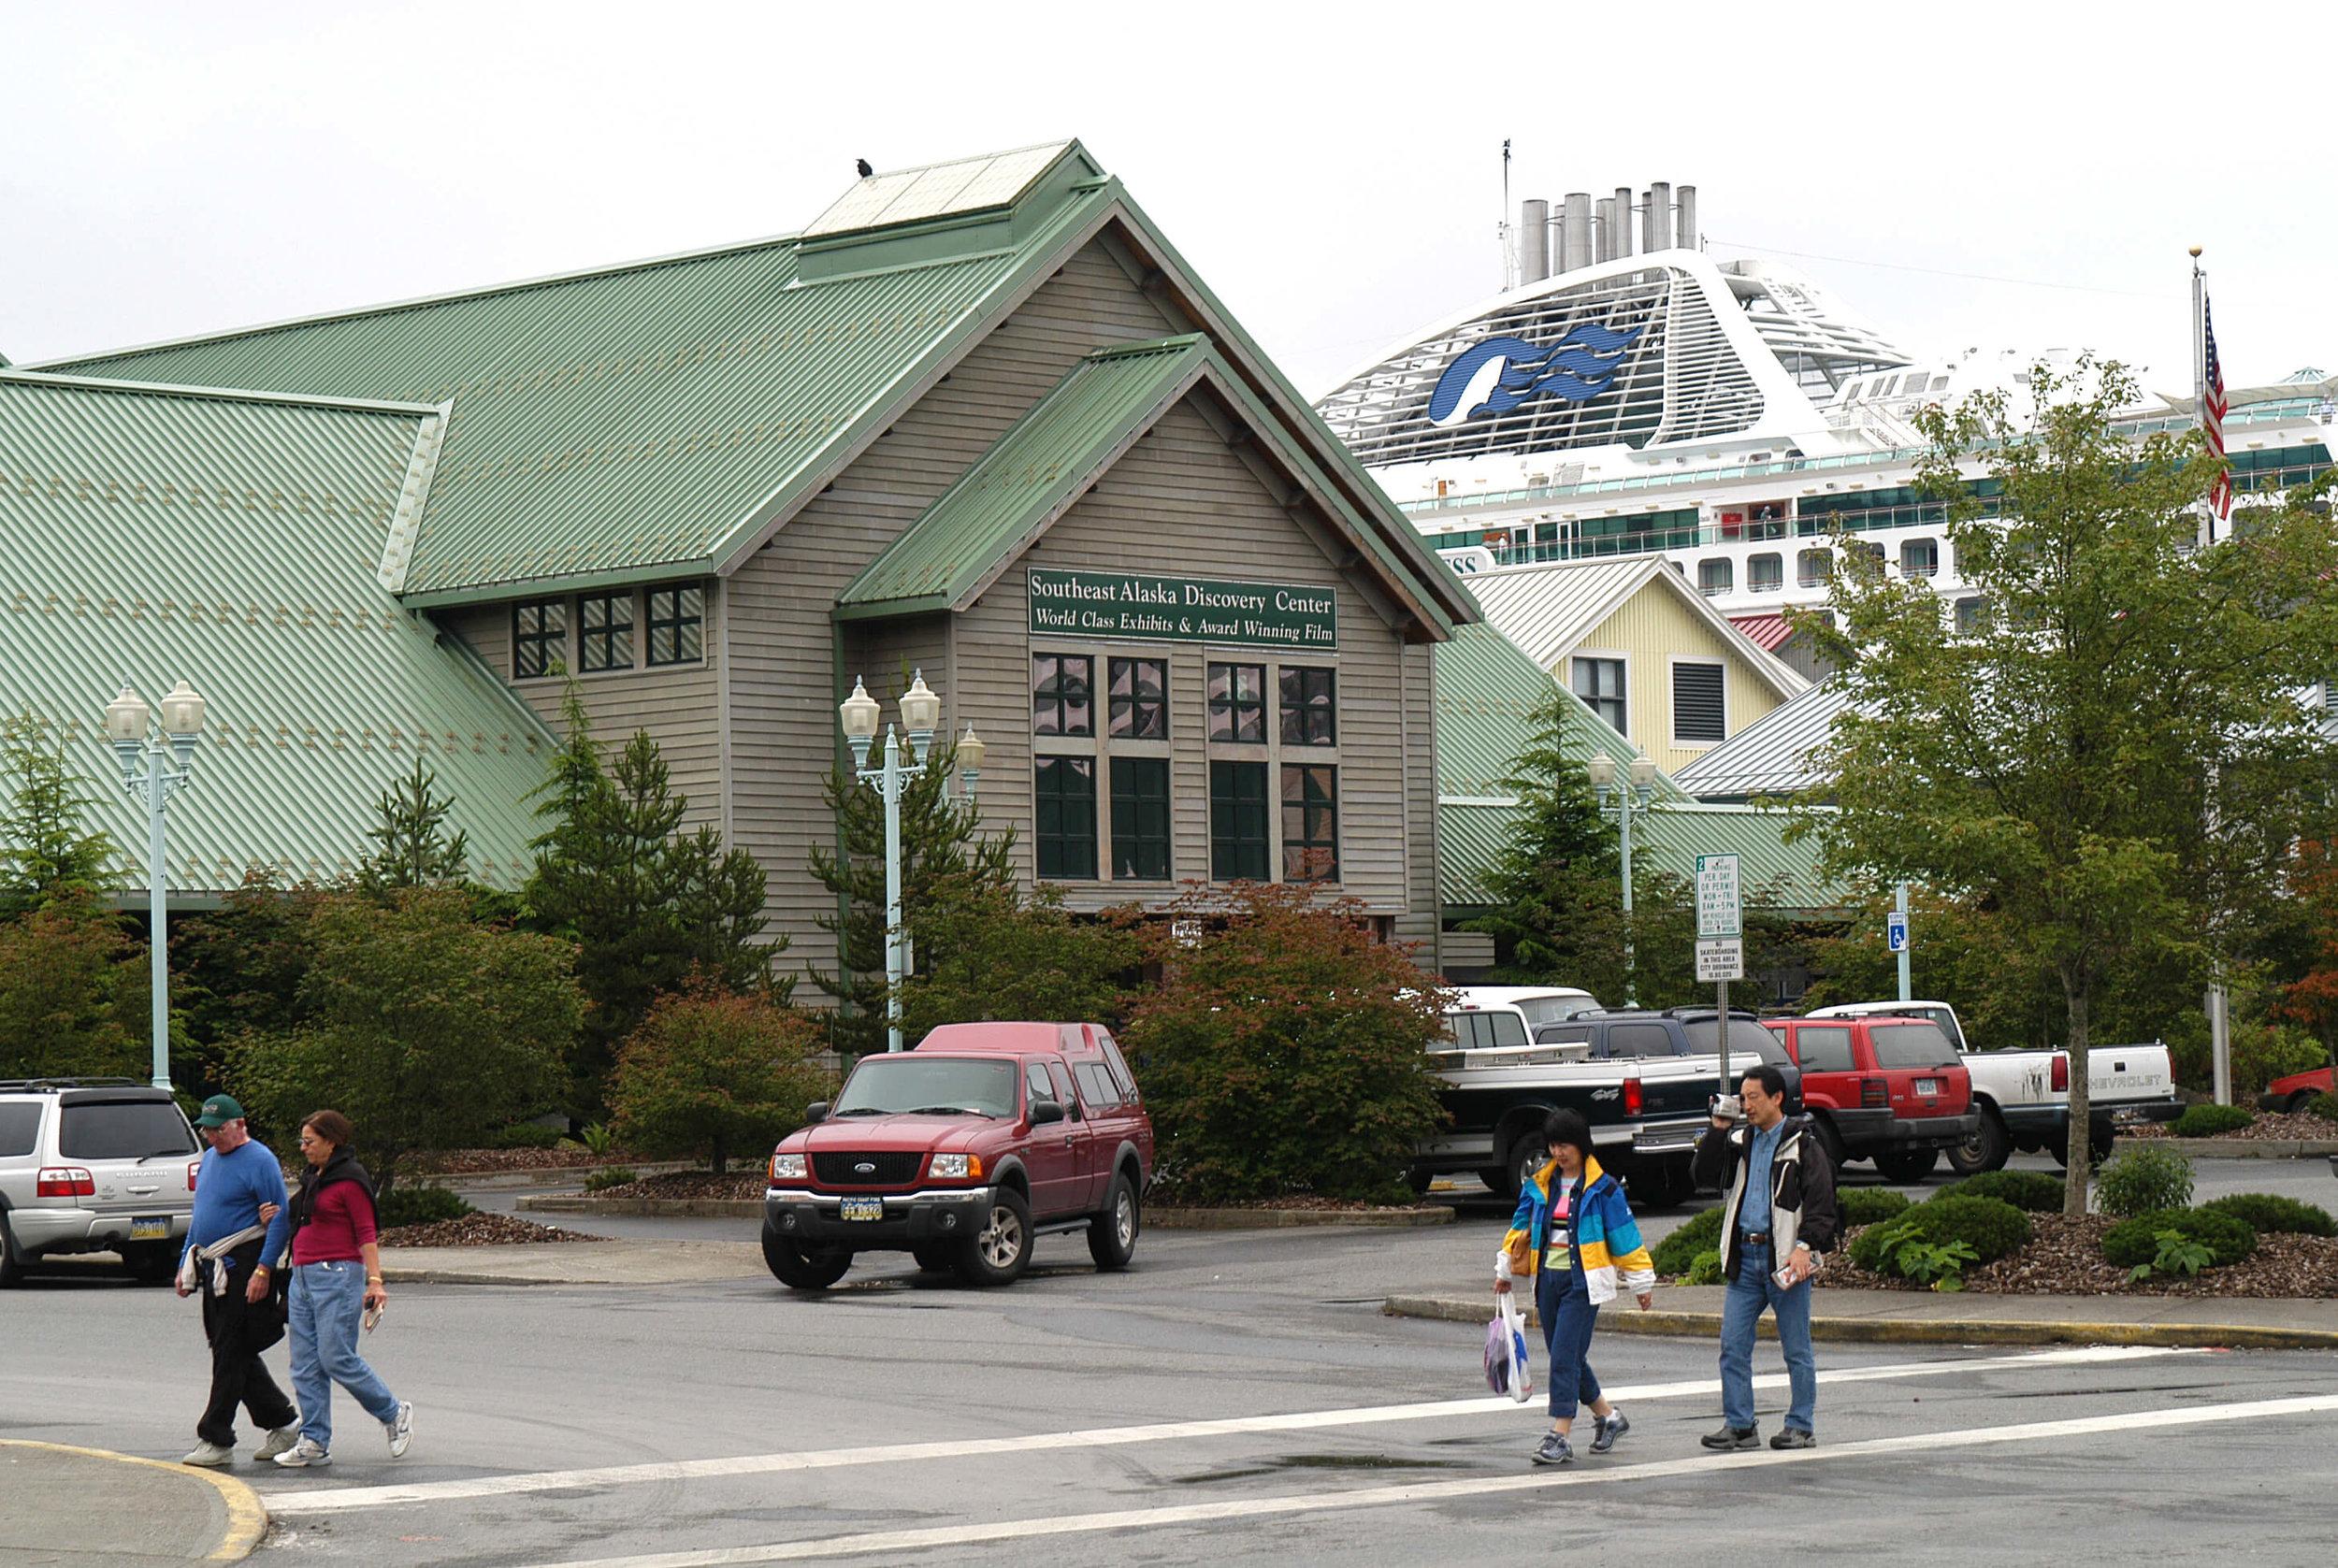 1-Southeast Alaska Discovery Center-1-Building-The Sibbett Group-USFS-flickr-Tom Iraci.jpg